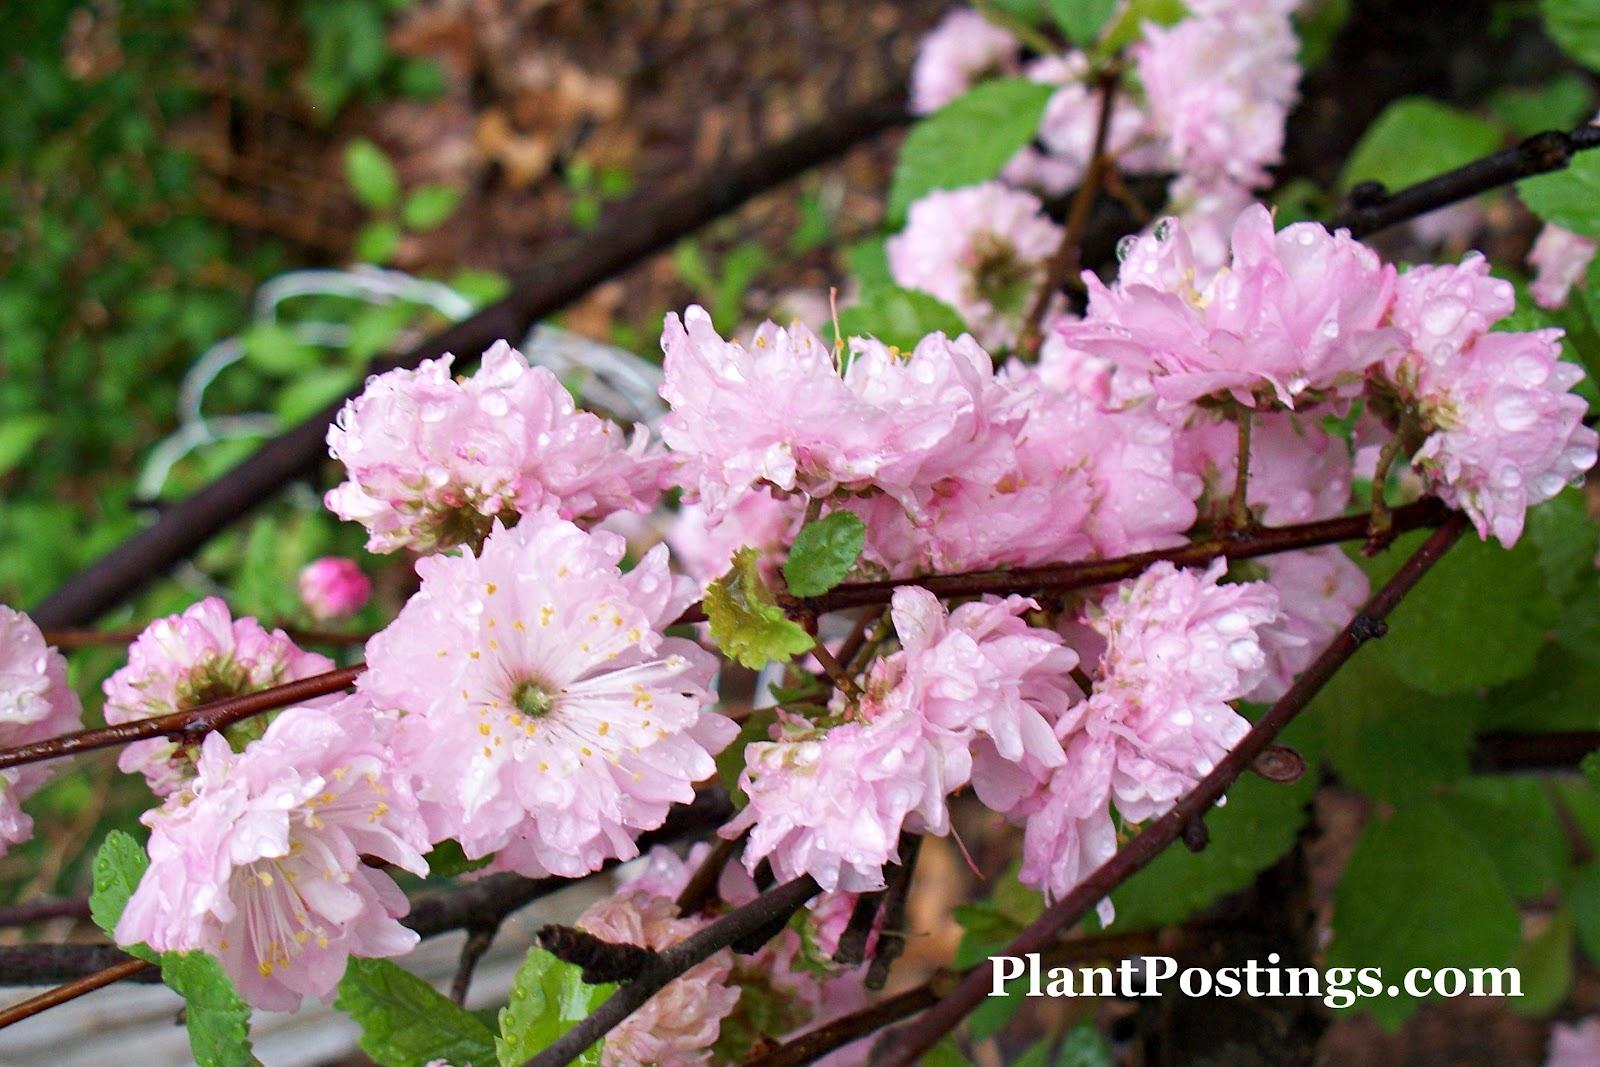 PlantPostings: Plant of the month: Dwarf Flowering Almond